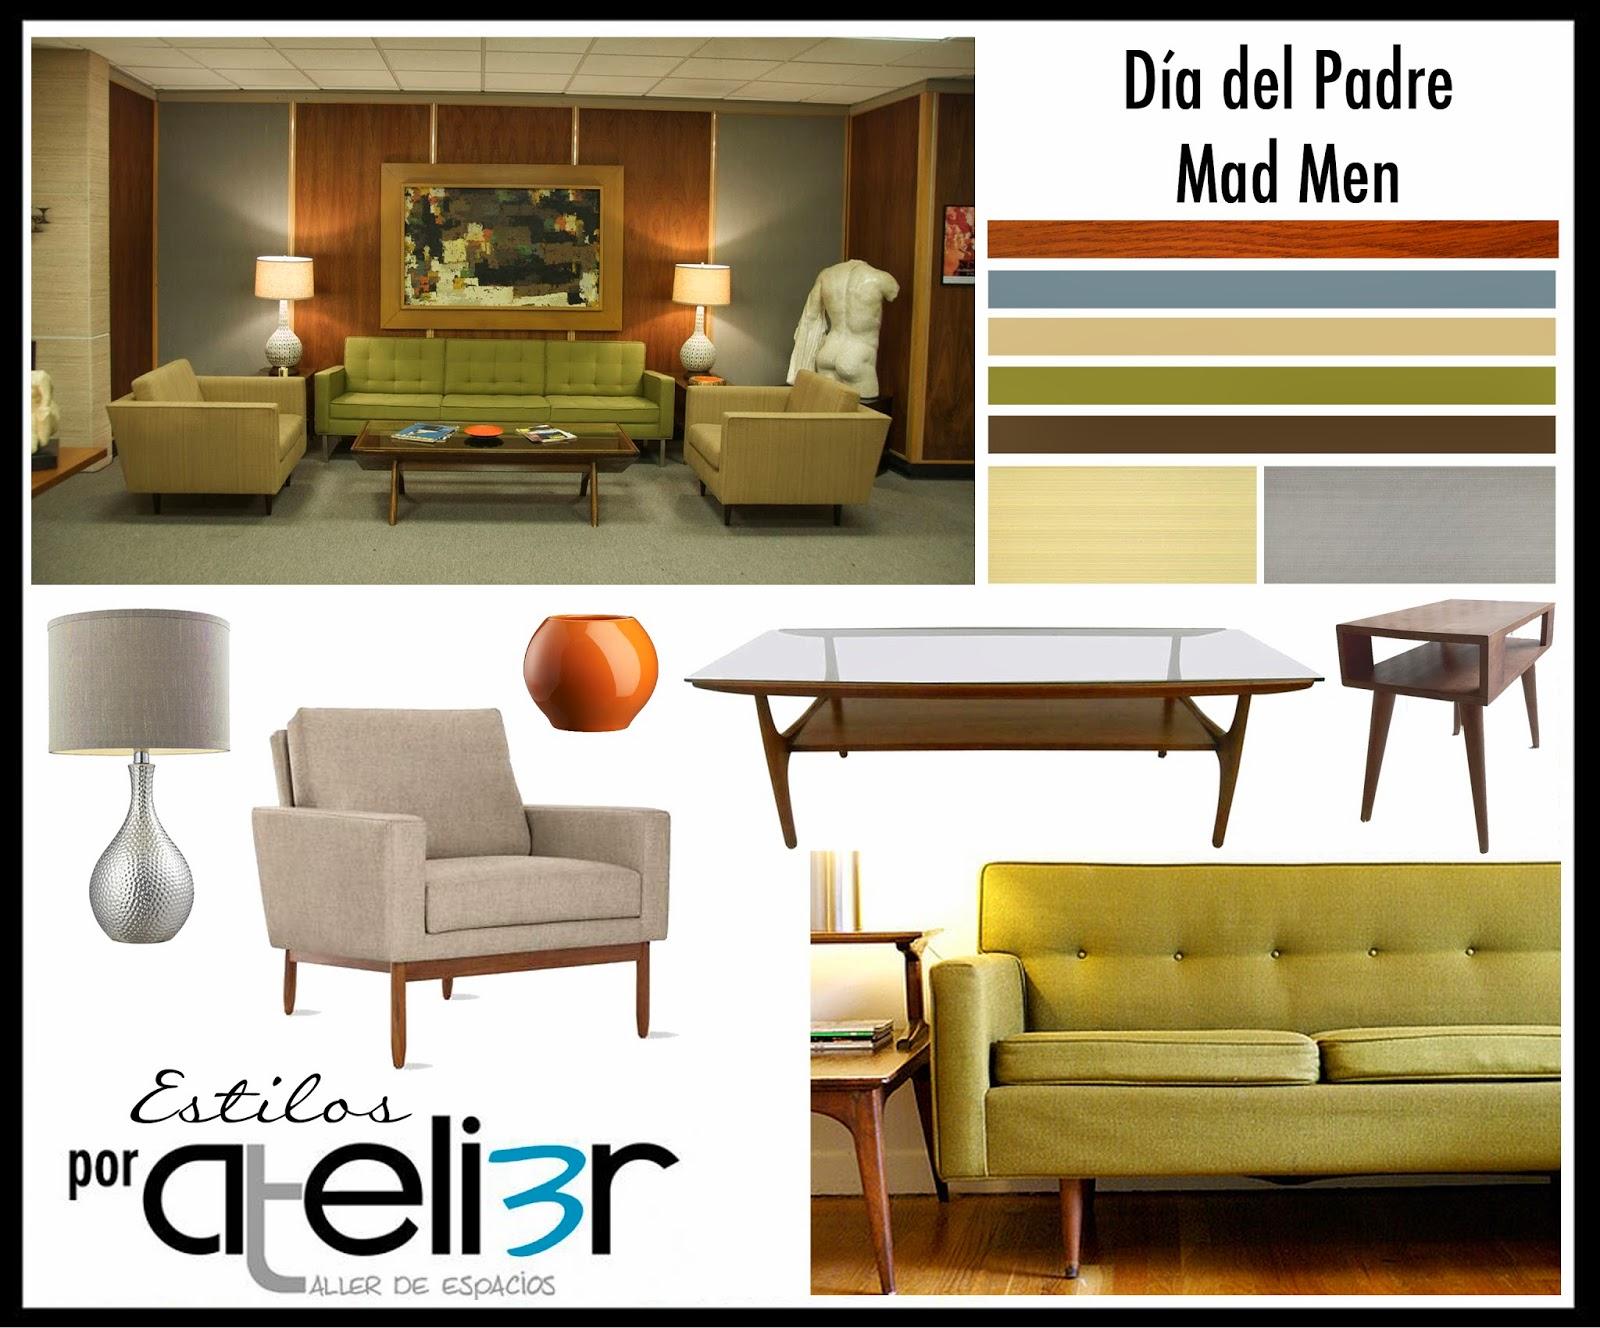 Atelier taller de espacios, guatemala diseño de interiores, guatemala decoración